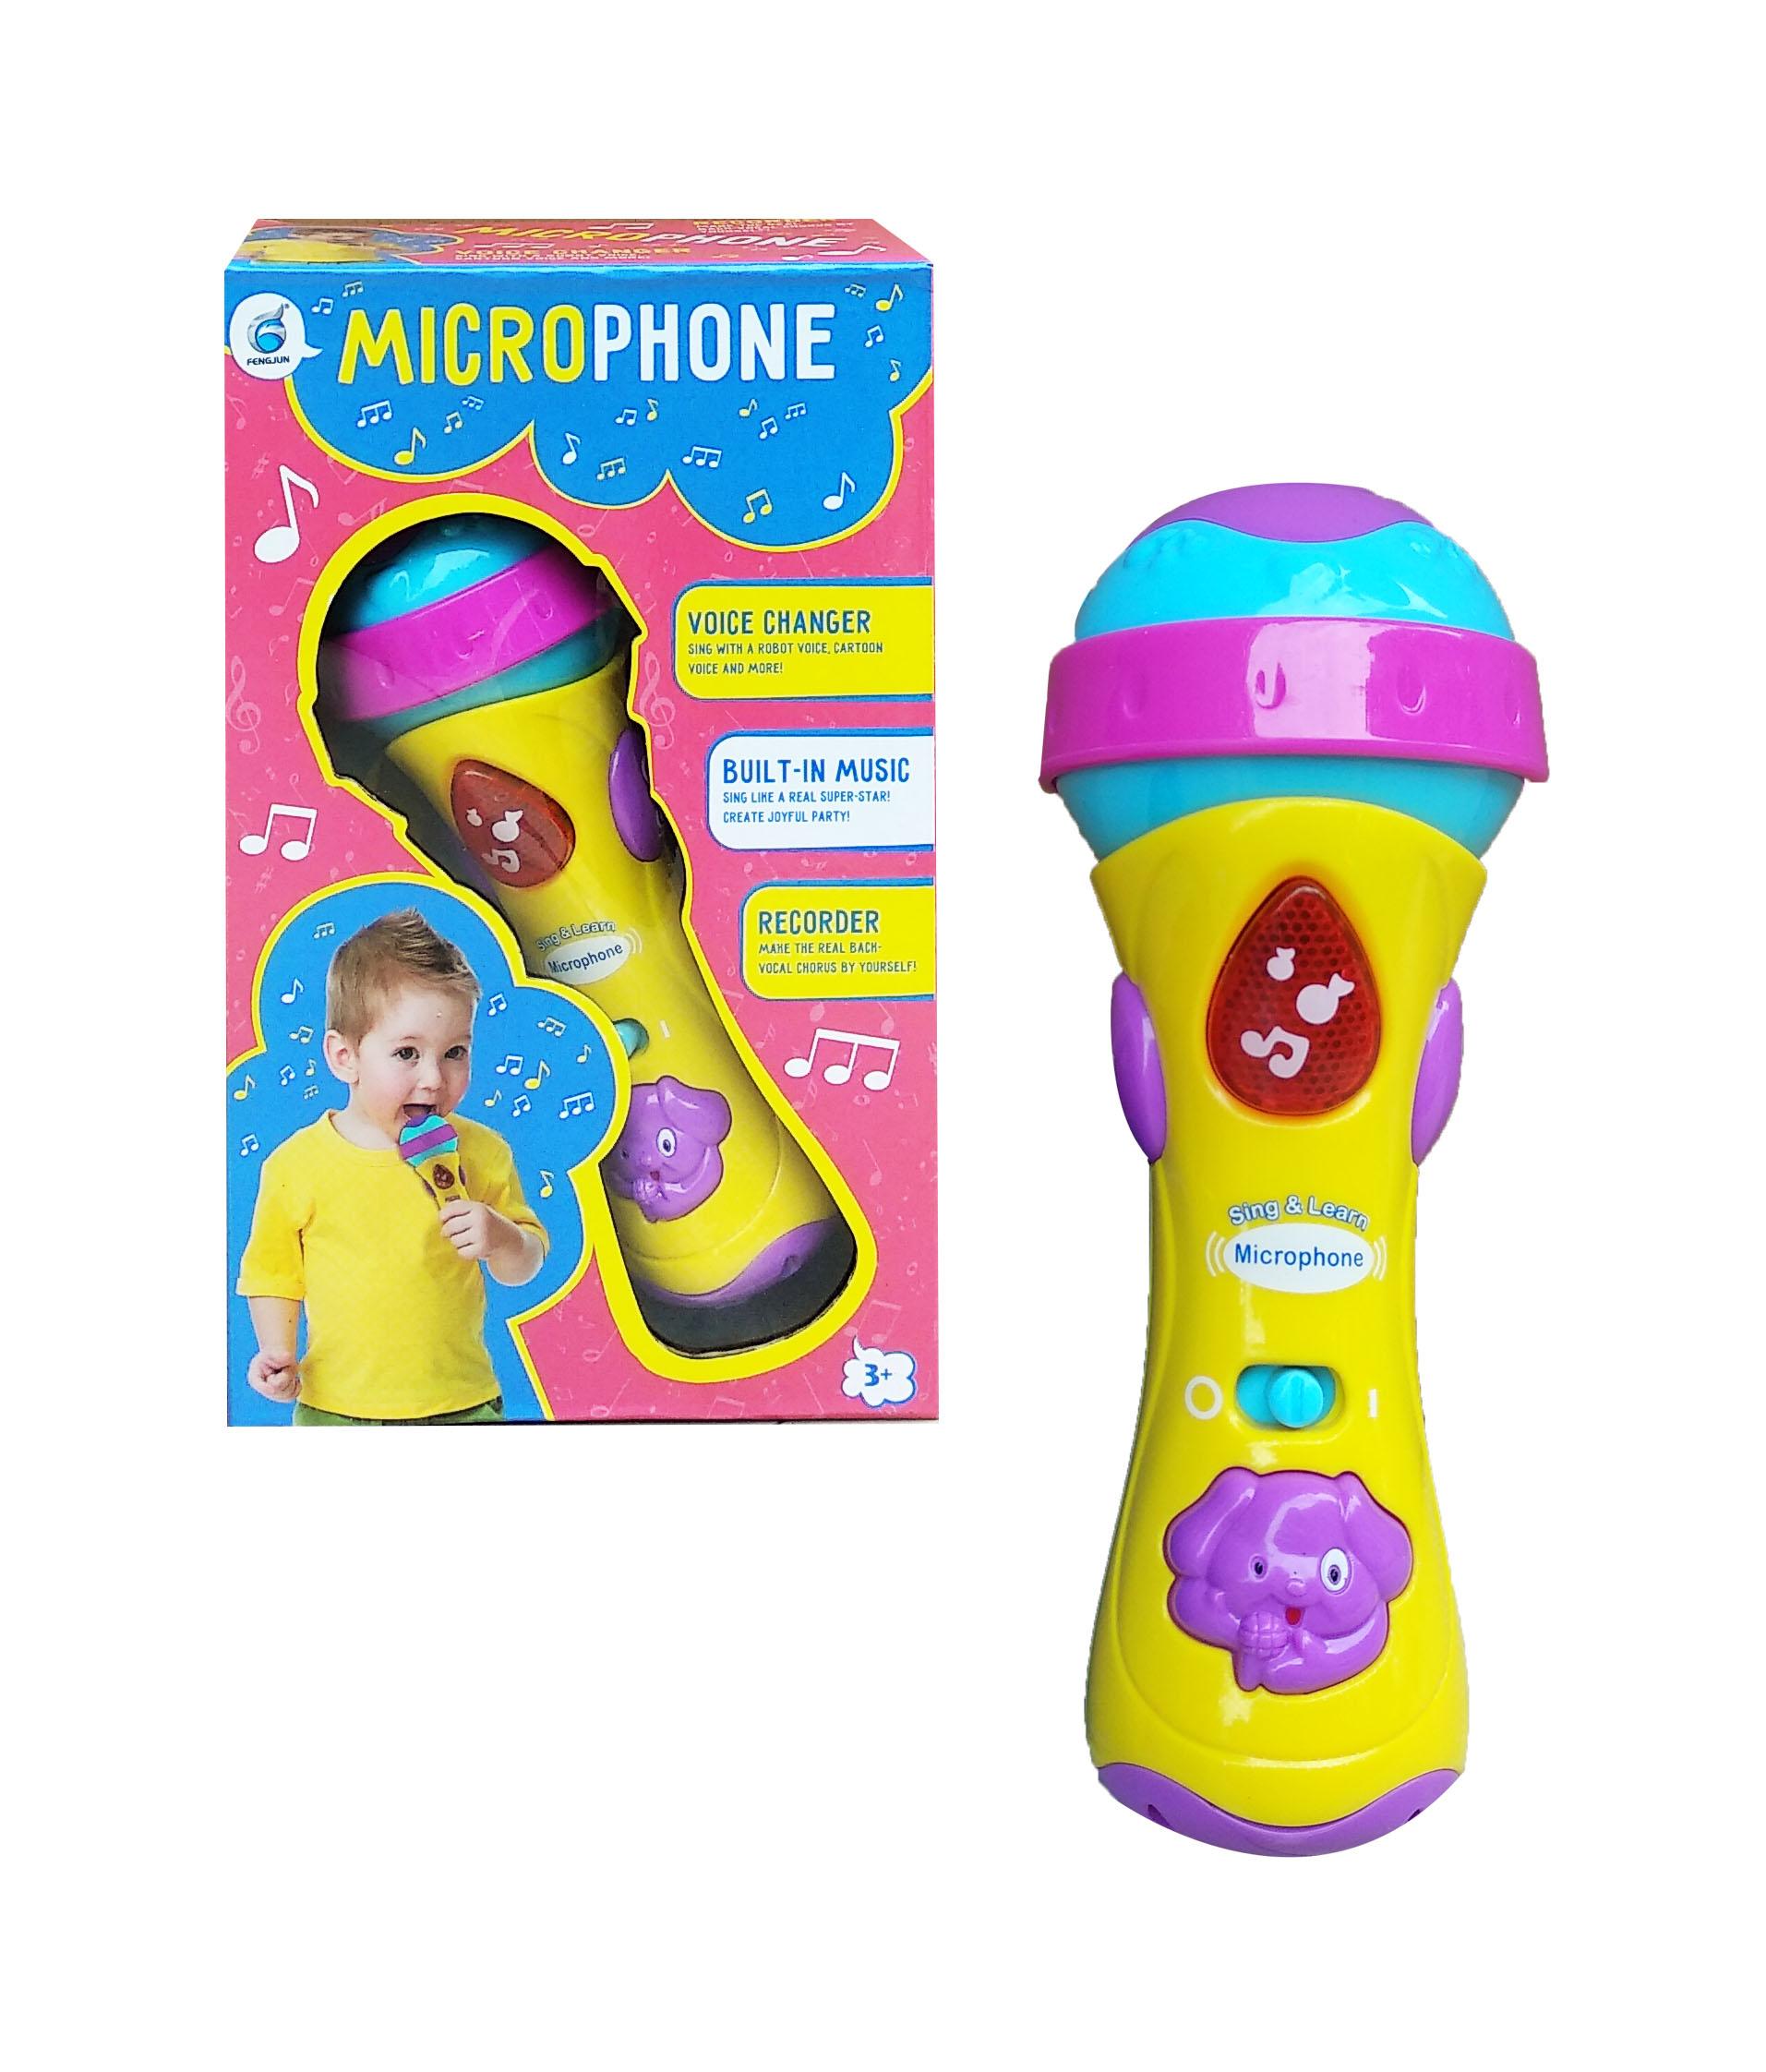 toko mainan online SING & LEARN MICROPHONE - 5258D